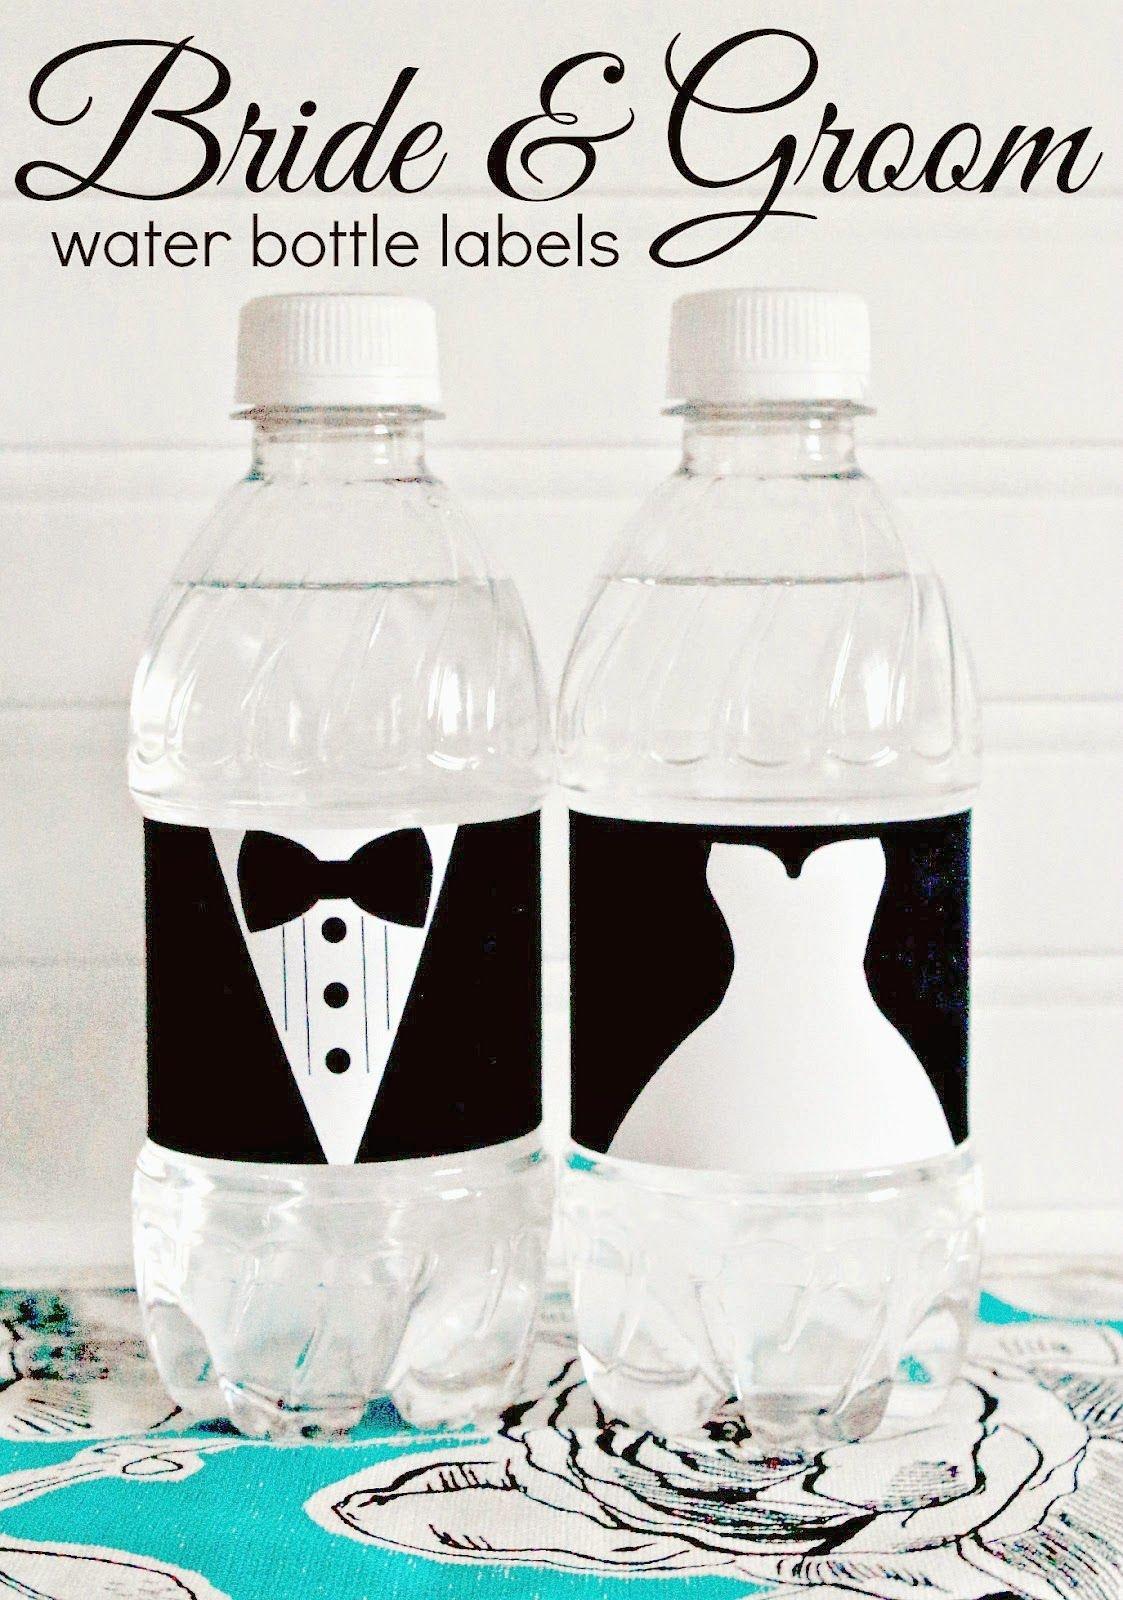 Free Printable - Bride And Groom Water Bottle Labels - Great For - Free Printable Water Bottle Labels Bachelorette